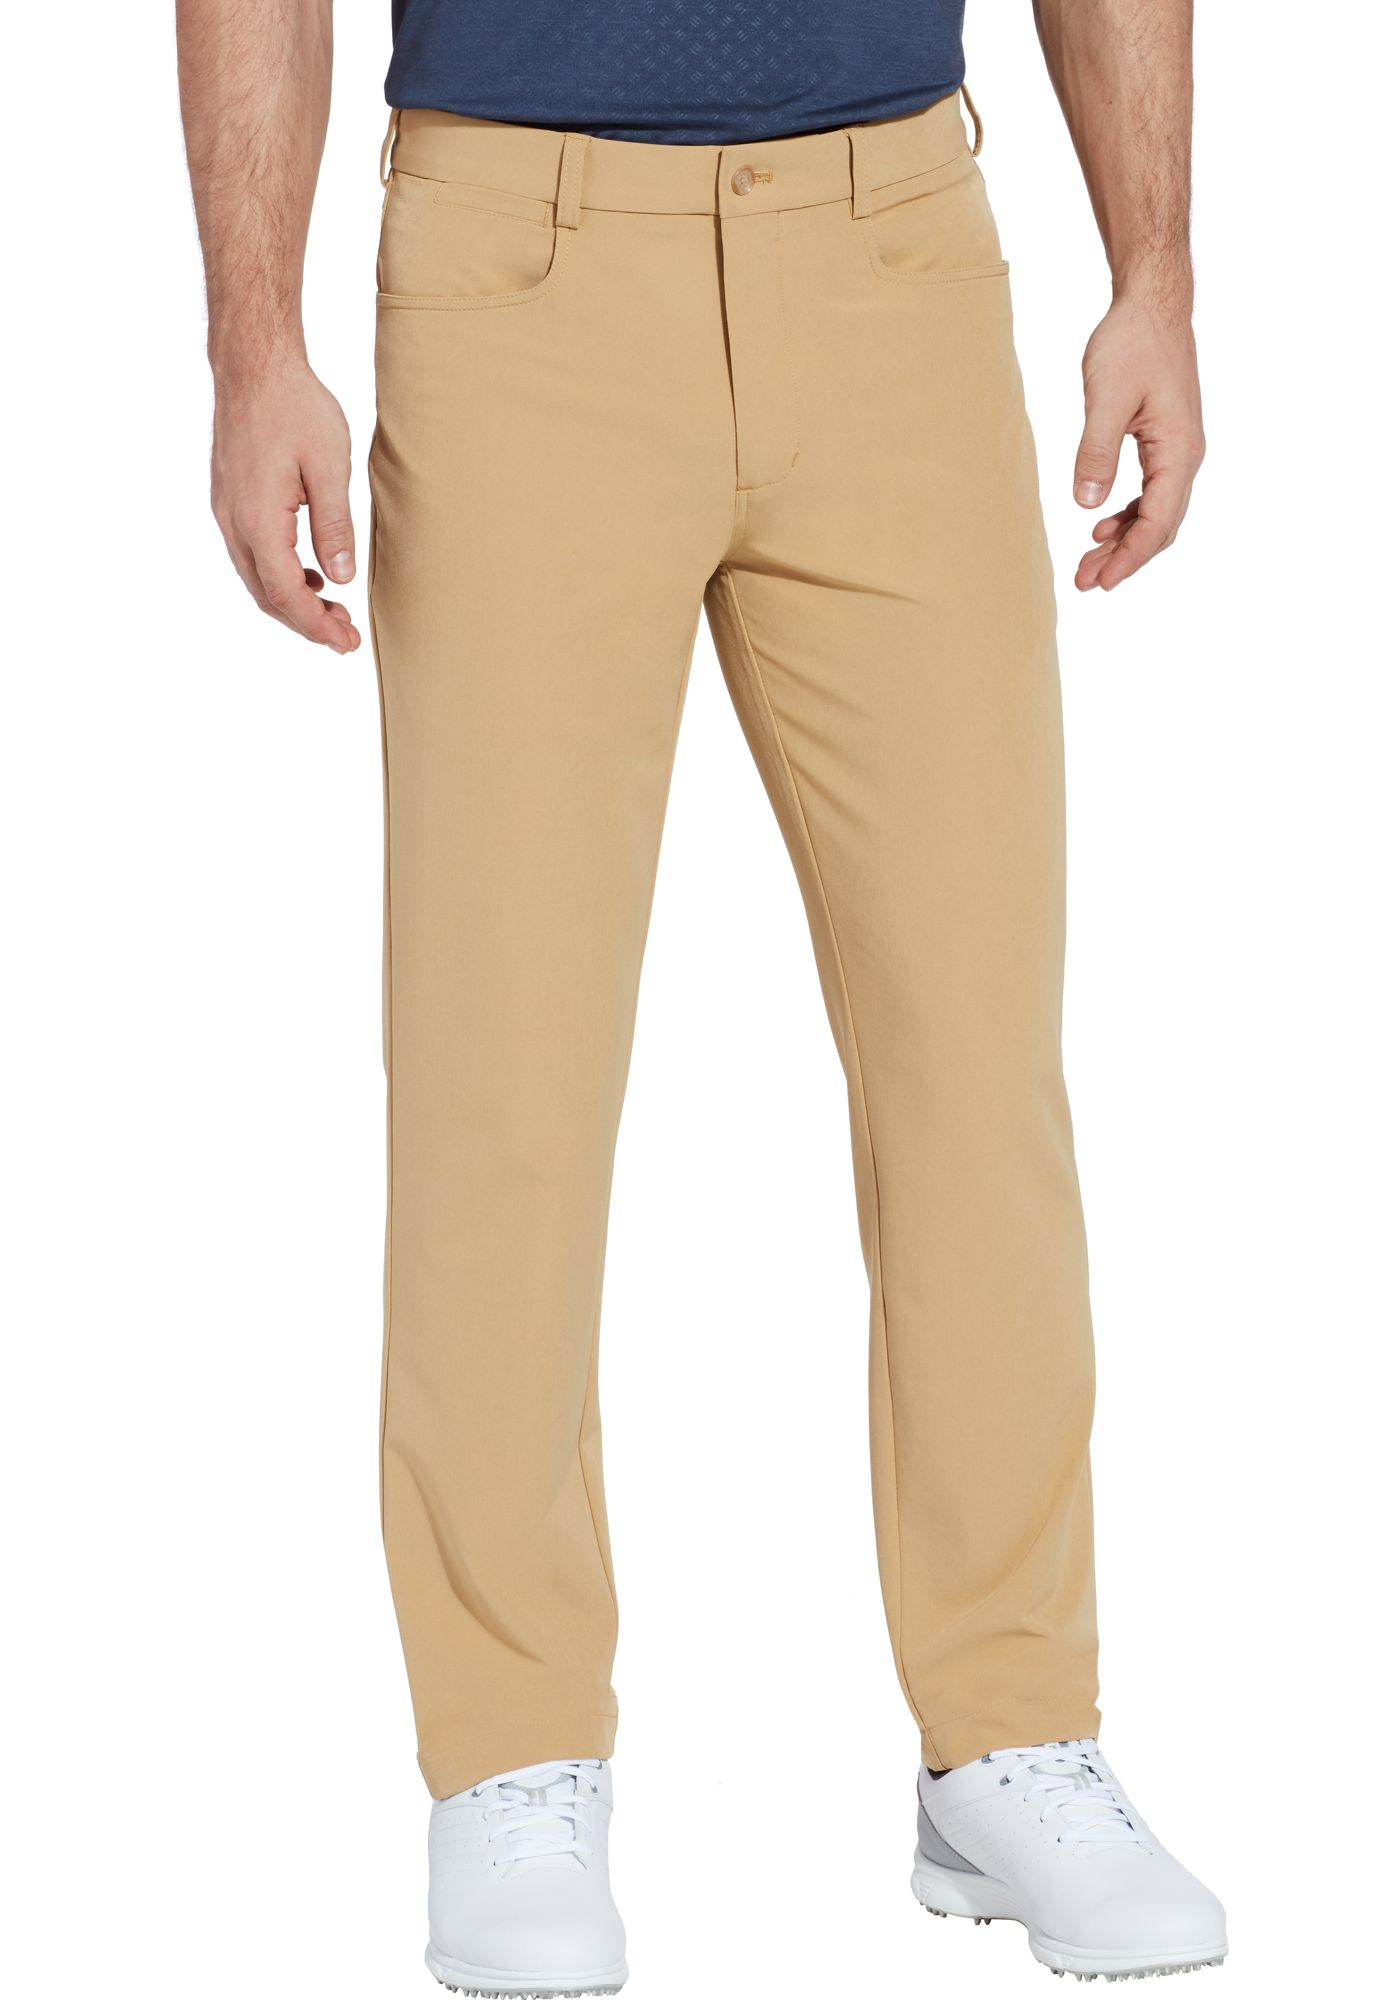 Walter Hagen Men's 5 Pocket Slim Fit Golf Pants